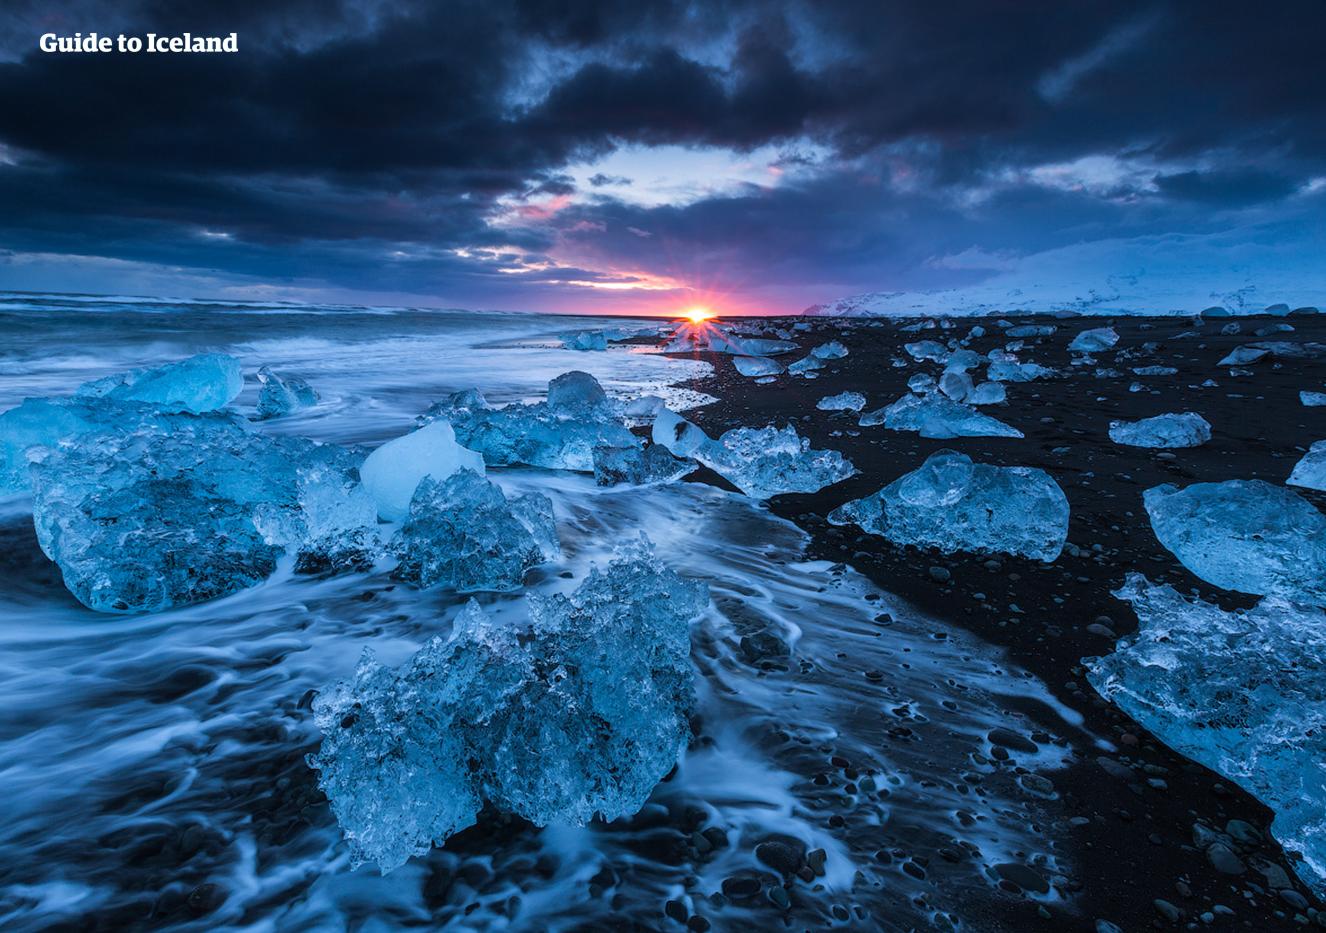 Автотур «Игра престолов» | Исландия за 10 дней - day 4